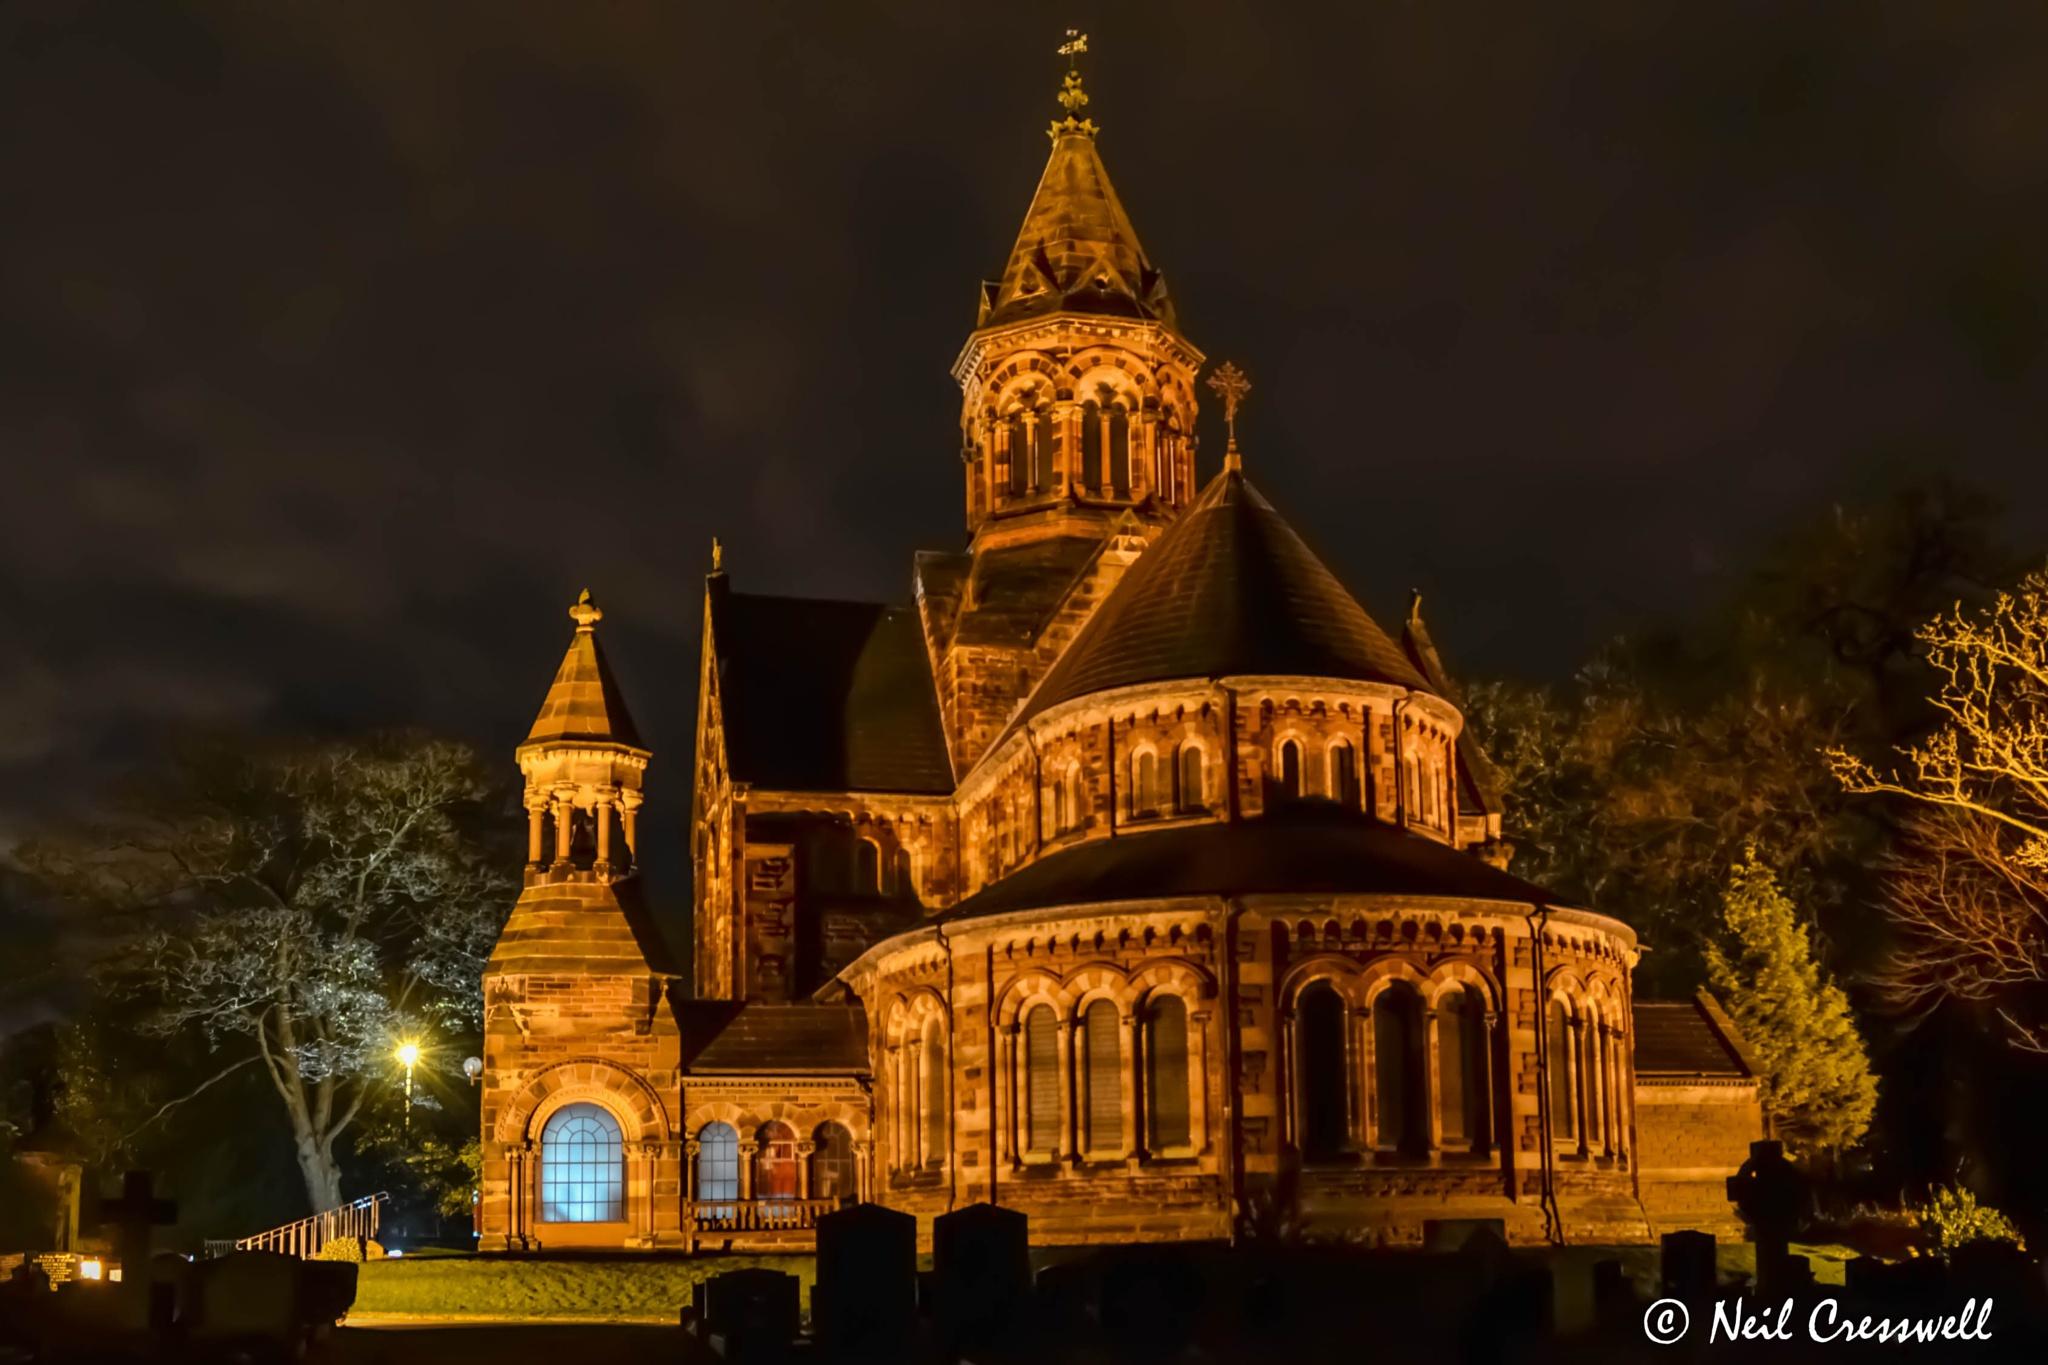 St Paul's church by Neil Cresswell